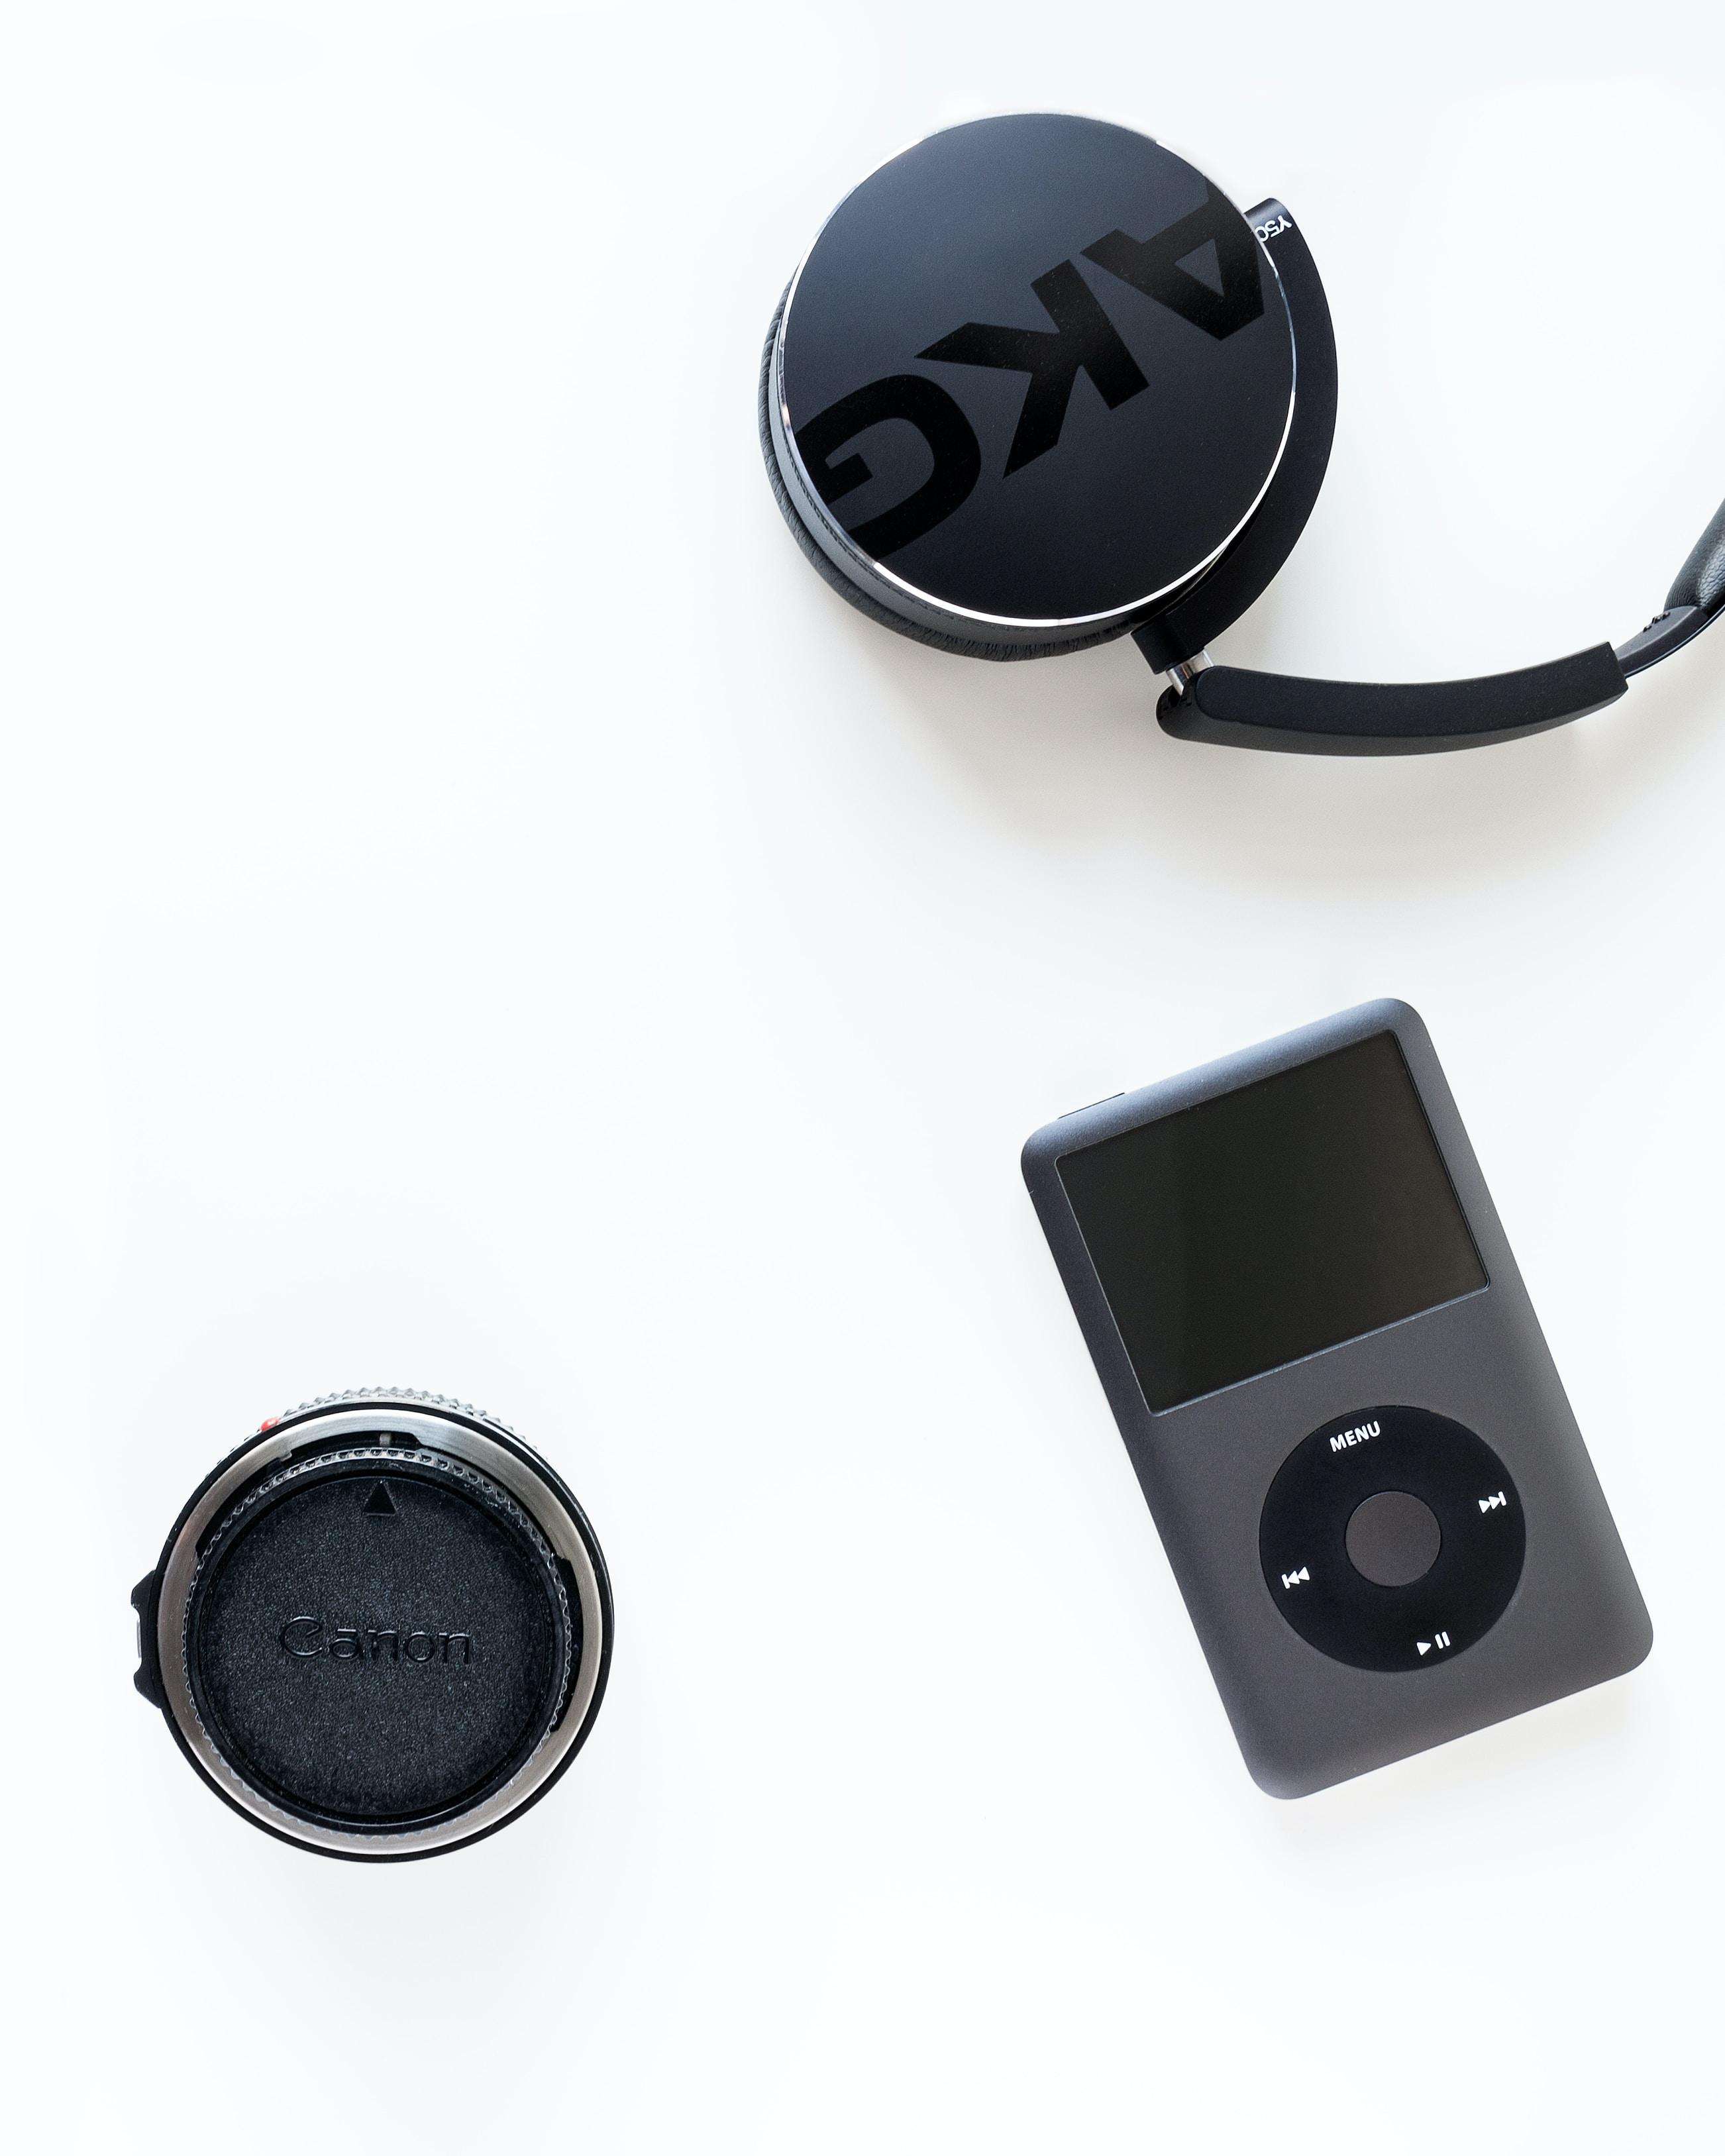 black iPod classic beside black Canon camera lens